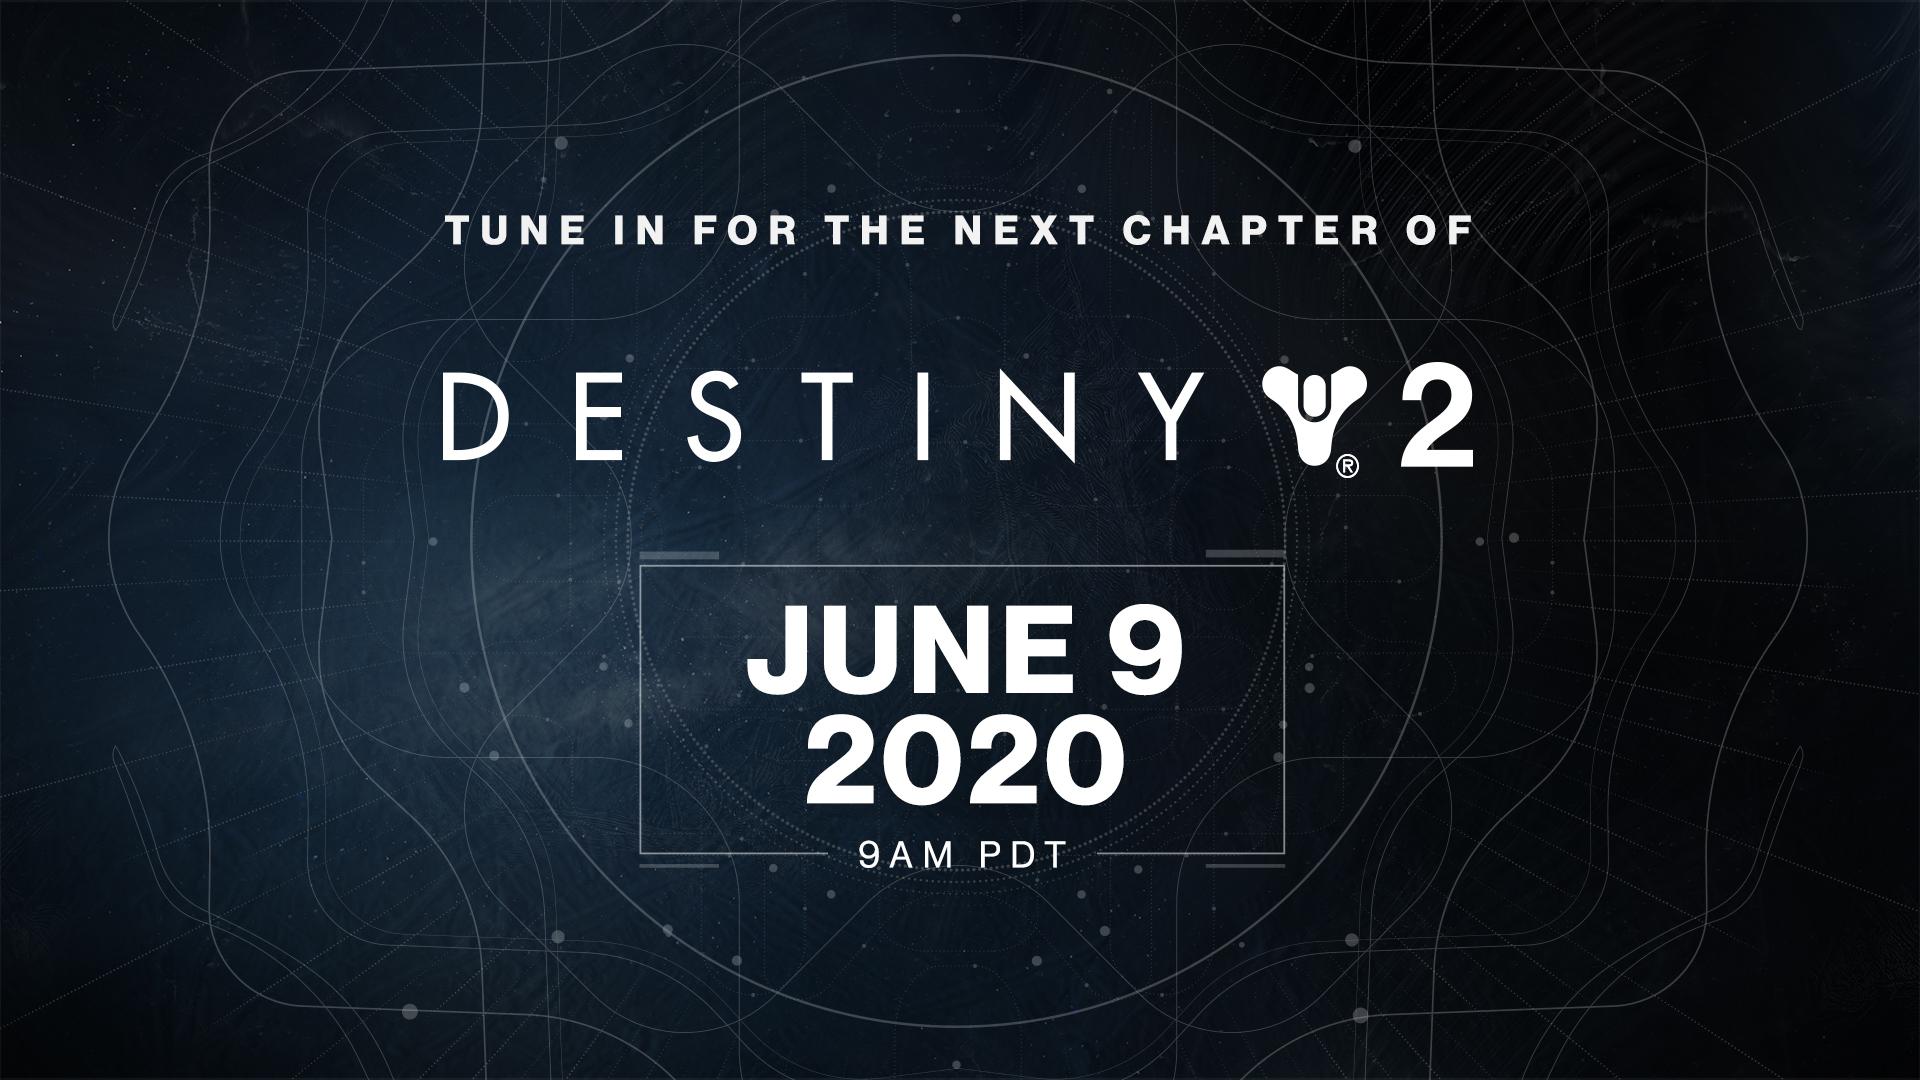 Destiny 2 Season Of Arrivals Year 4 Beyond Light Expansion Revealed